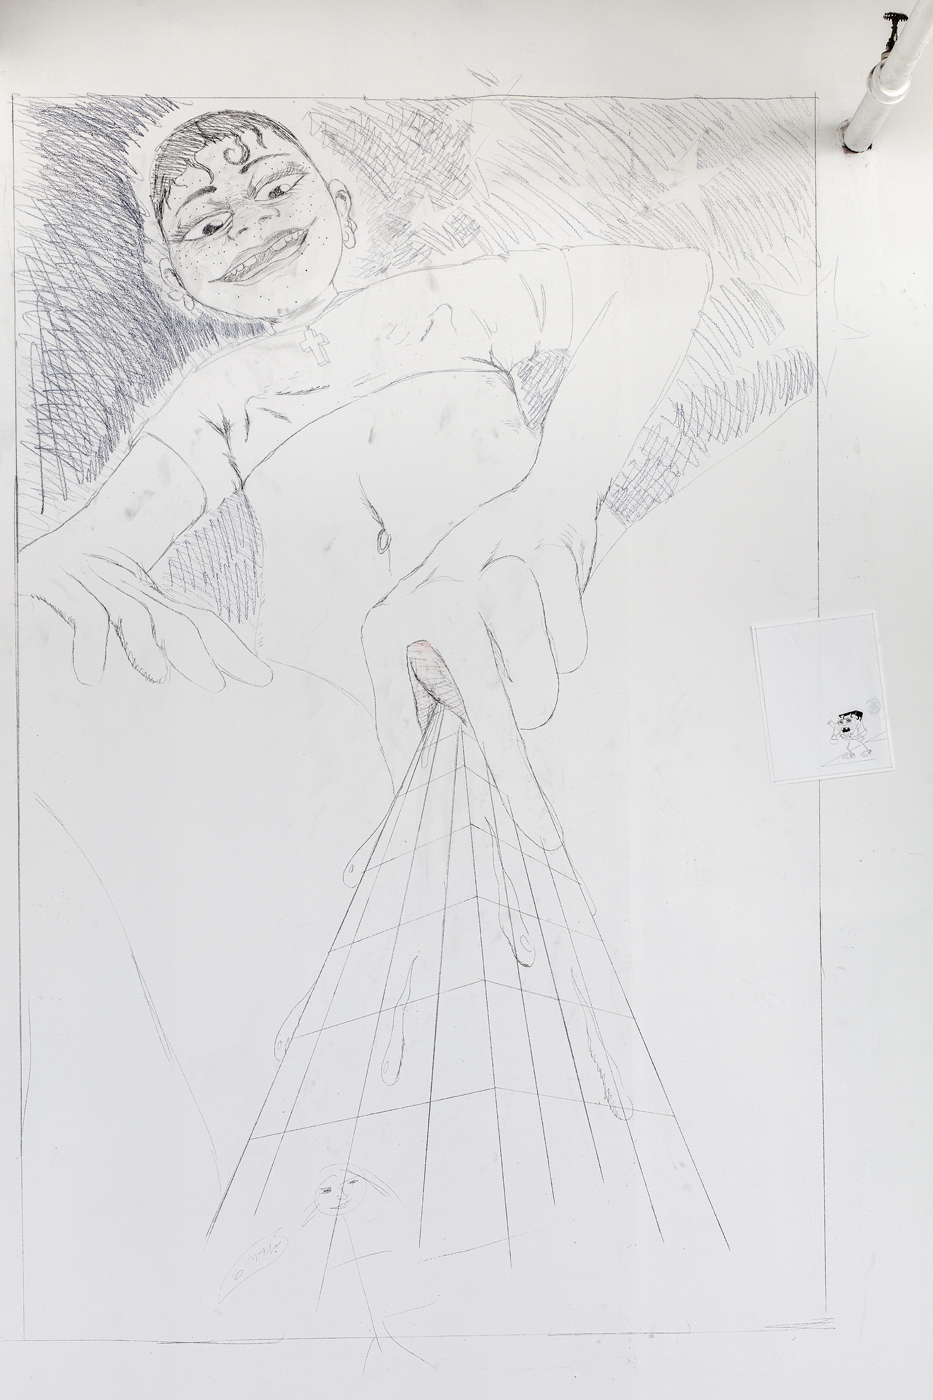 Gobby_Wall_Drawing_1.jpg